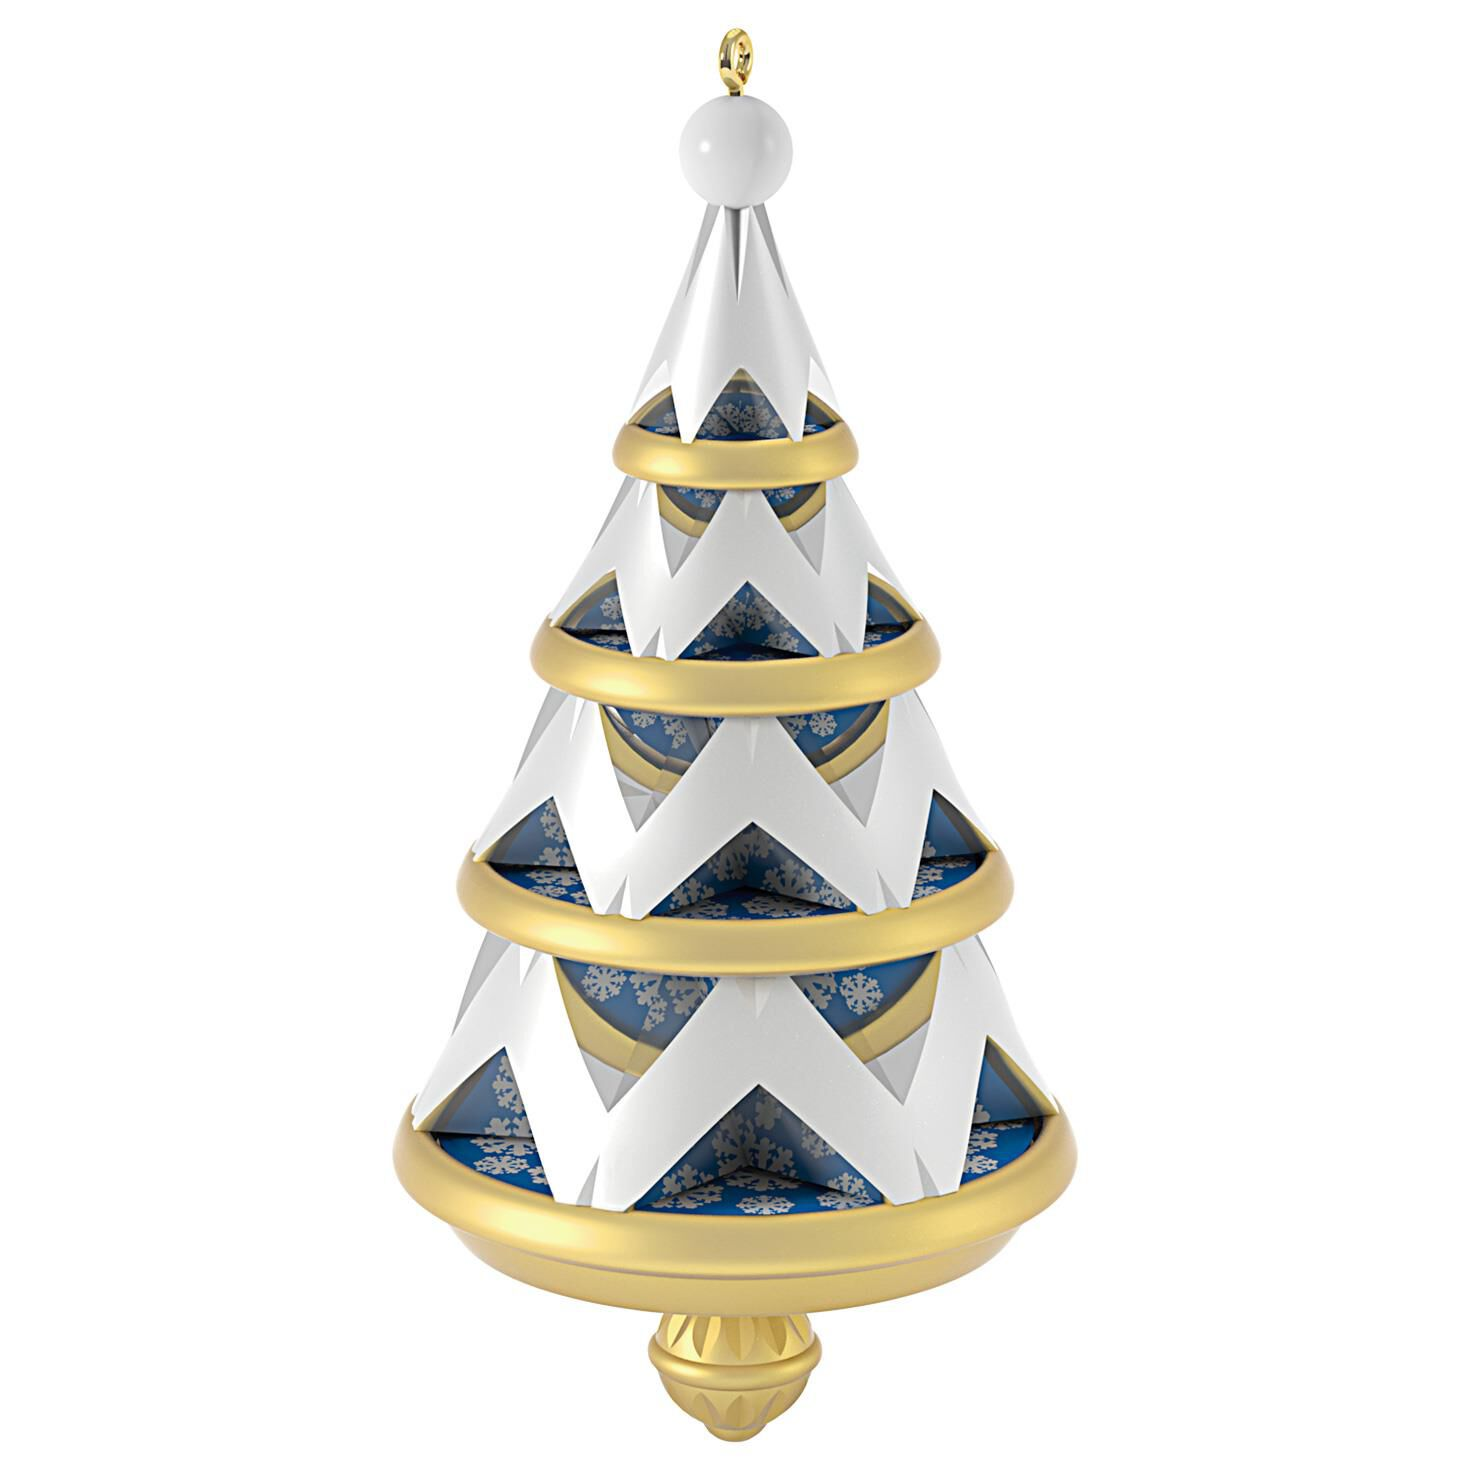 Hanukkah ornaments for a tree - Hanukkah Ornaments For A Tree 40